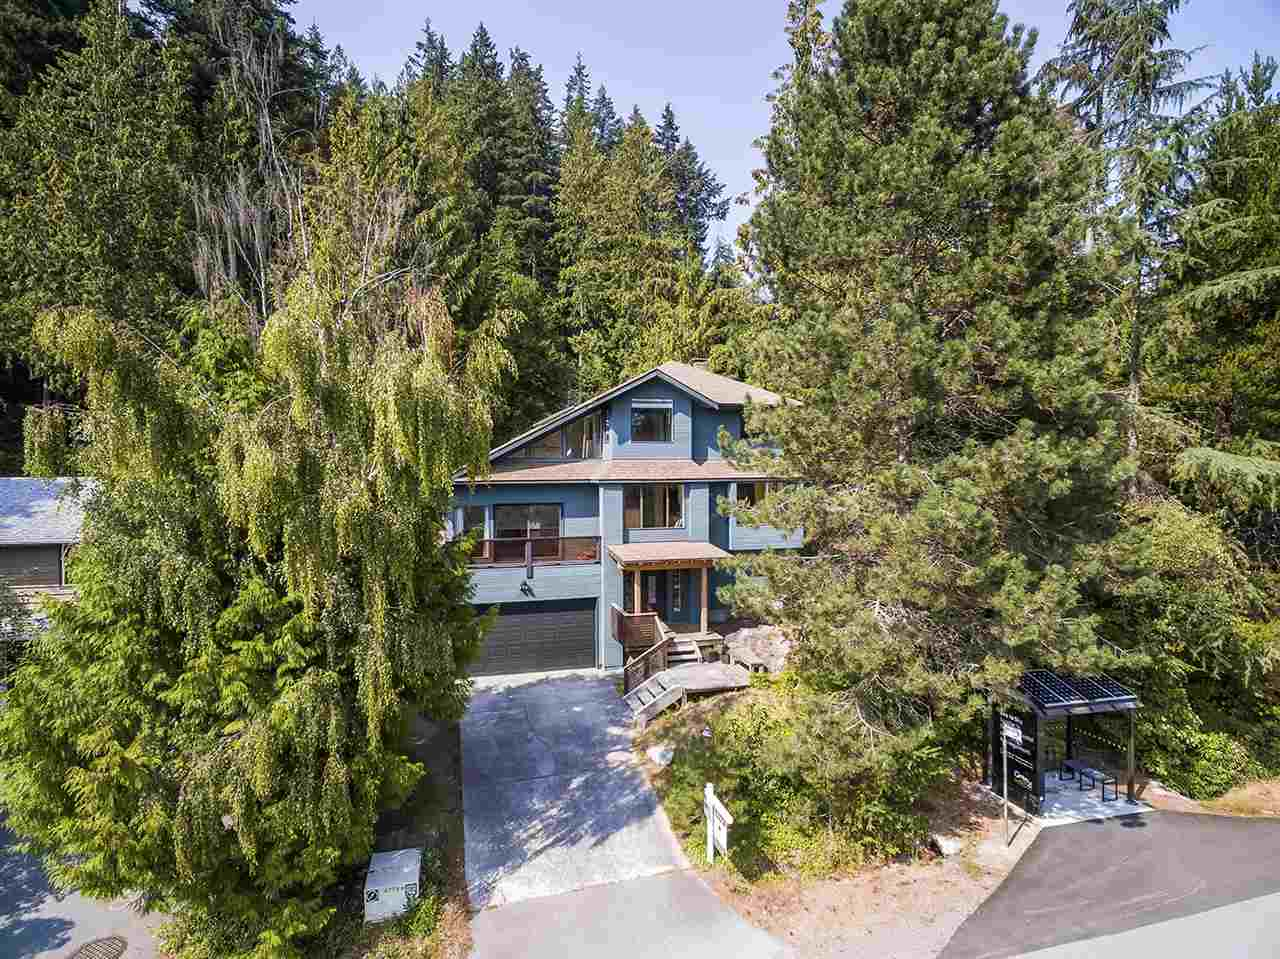 Sold: 40521 N Highlands Way, Squamish, BC